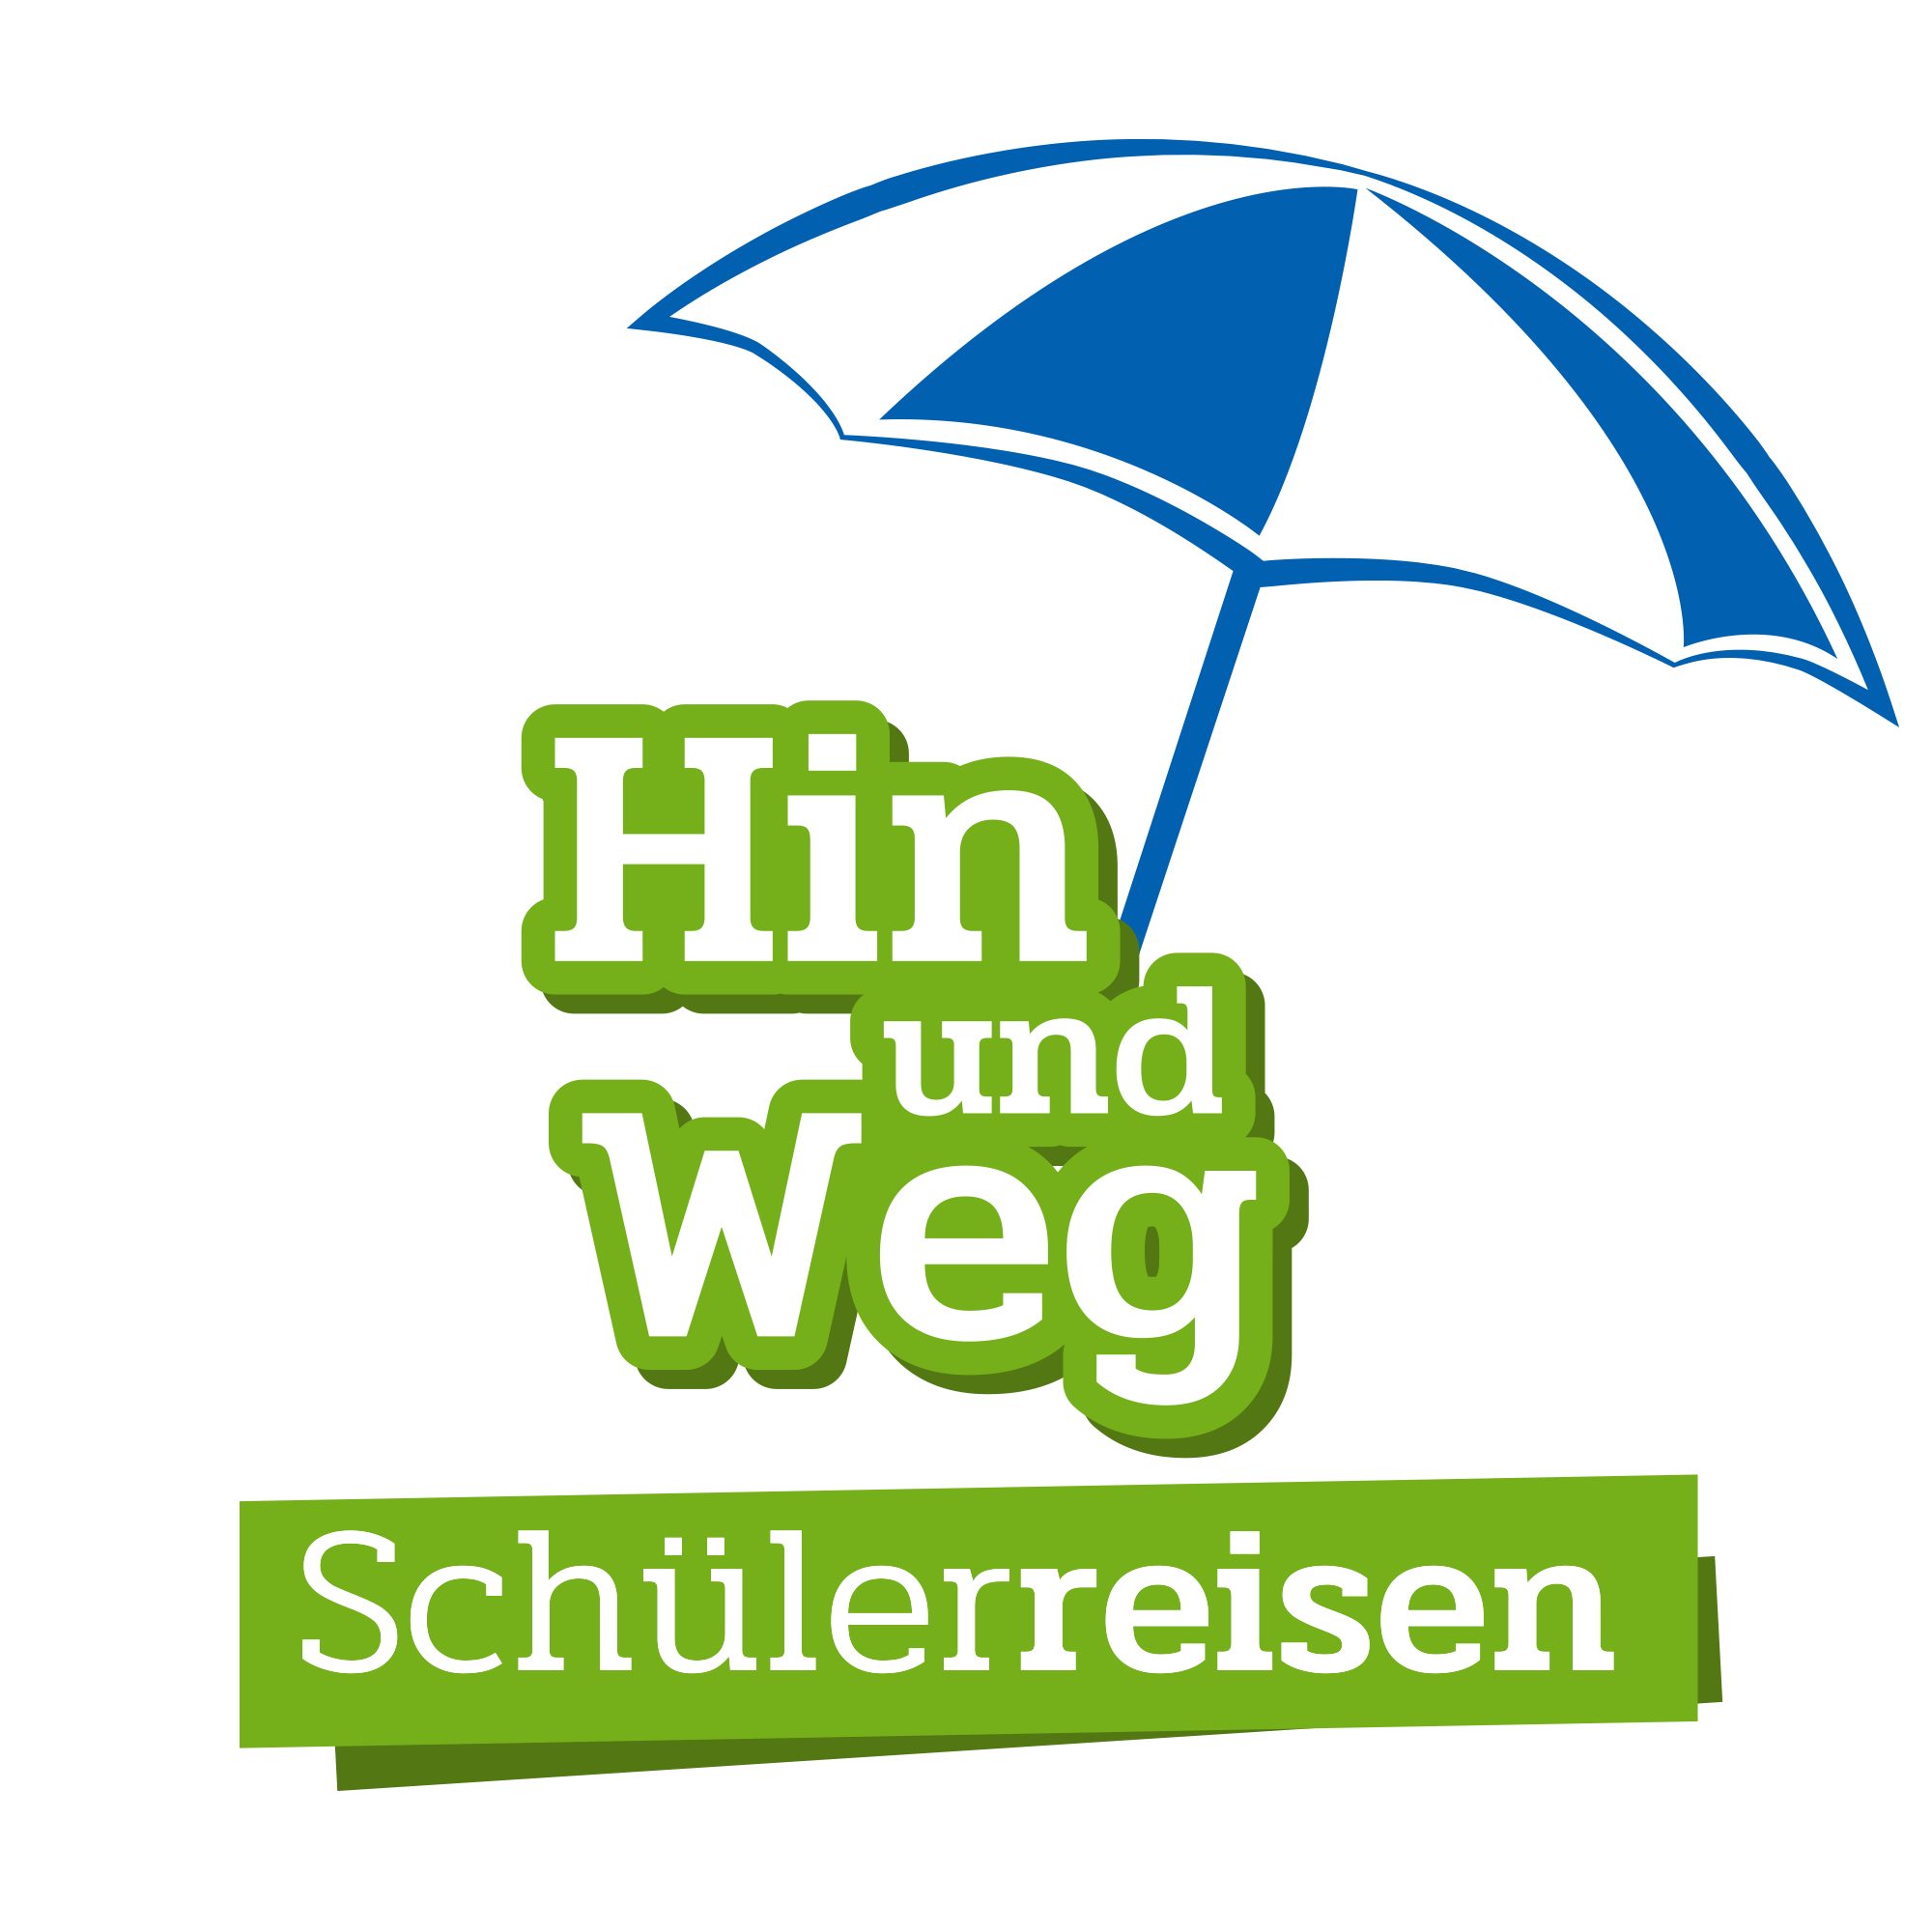 Hin & Weg Schülerreisen S-GmbH logo